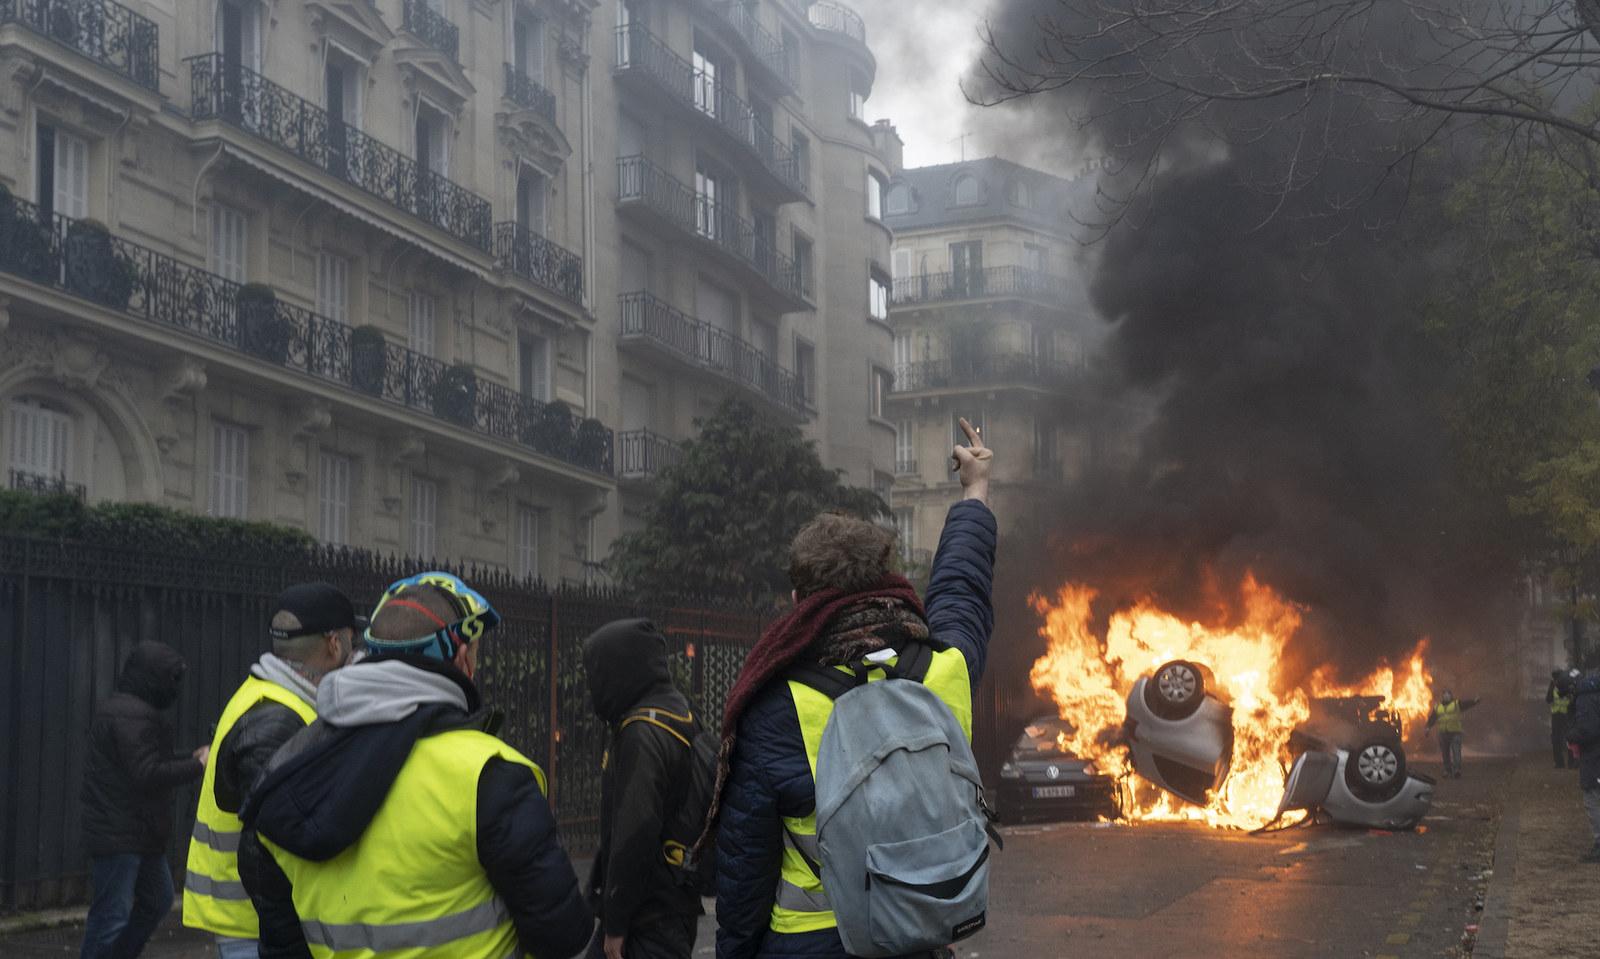 Cars on fire near the Arc de Triomphe in Paris.